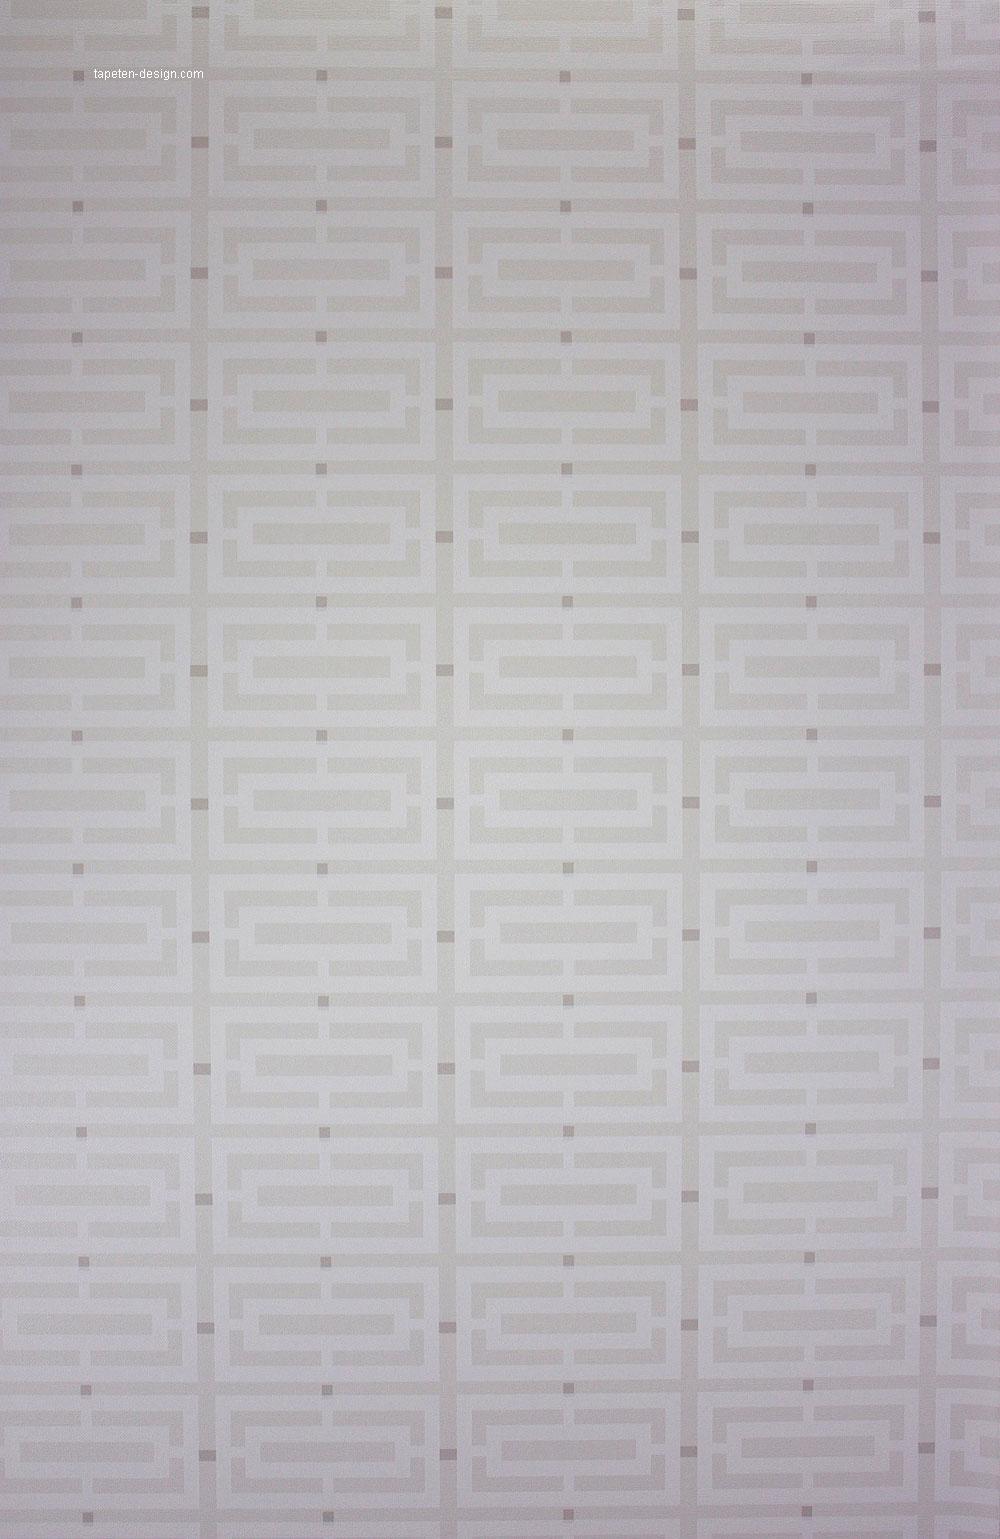 Tapeten design orientalisch grafisch osborne little kikko for Tapeten design